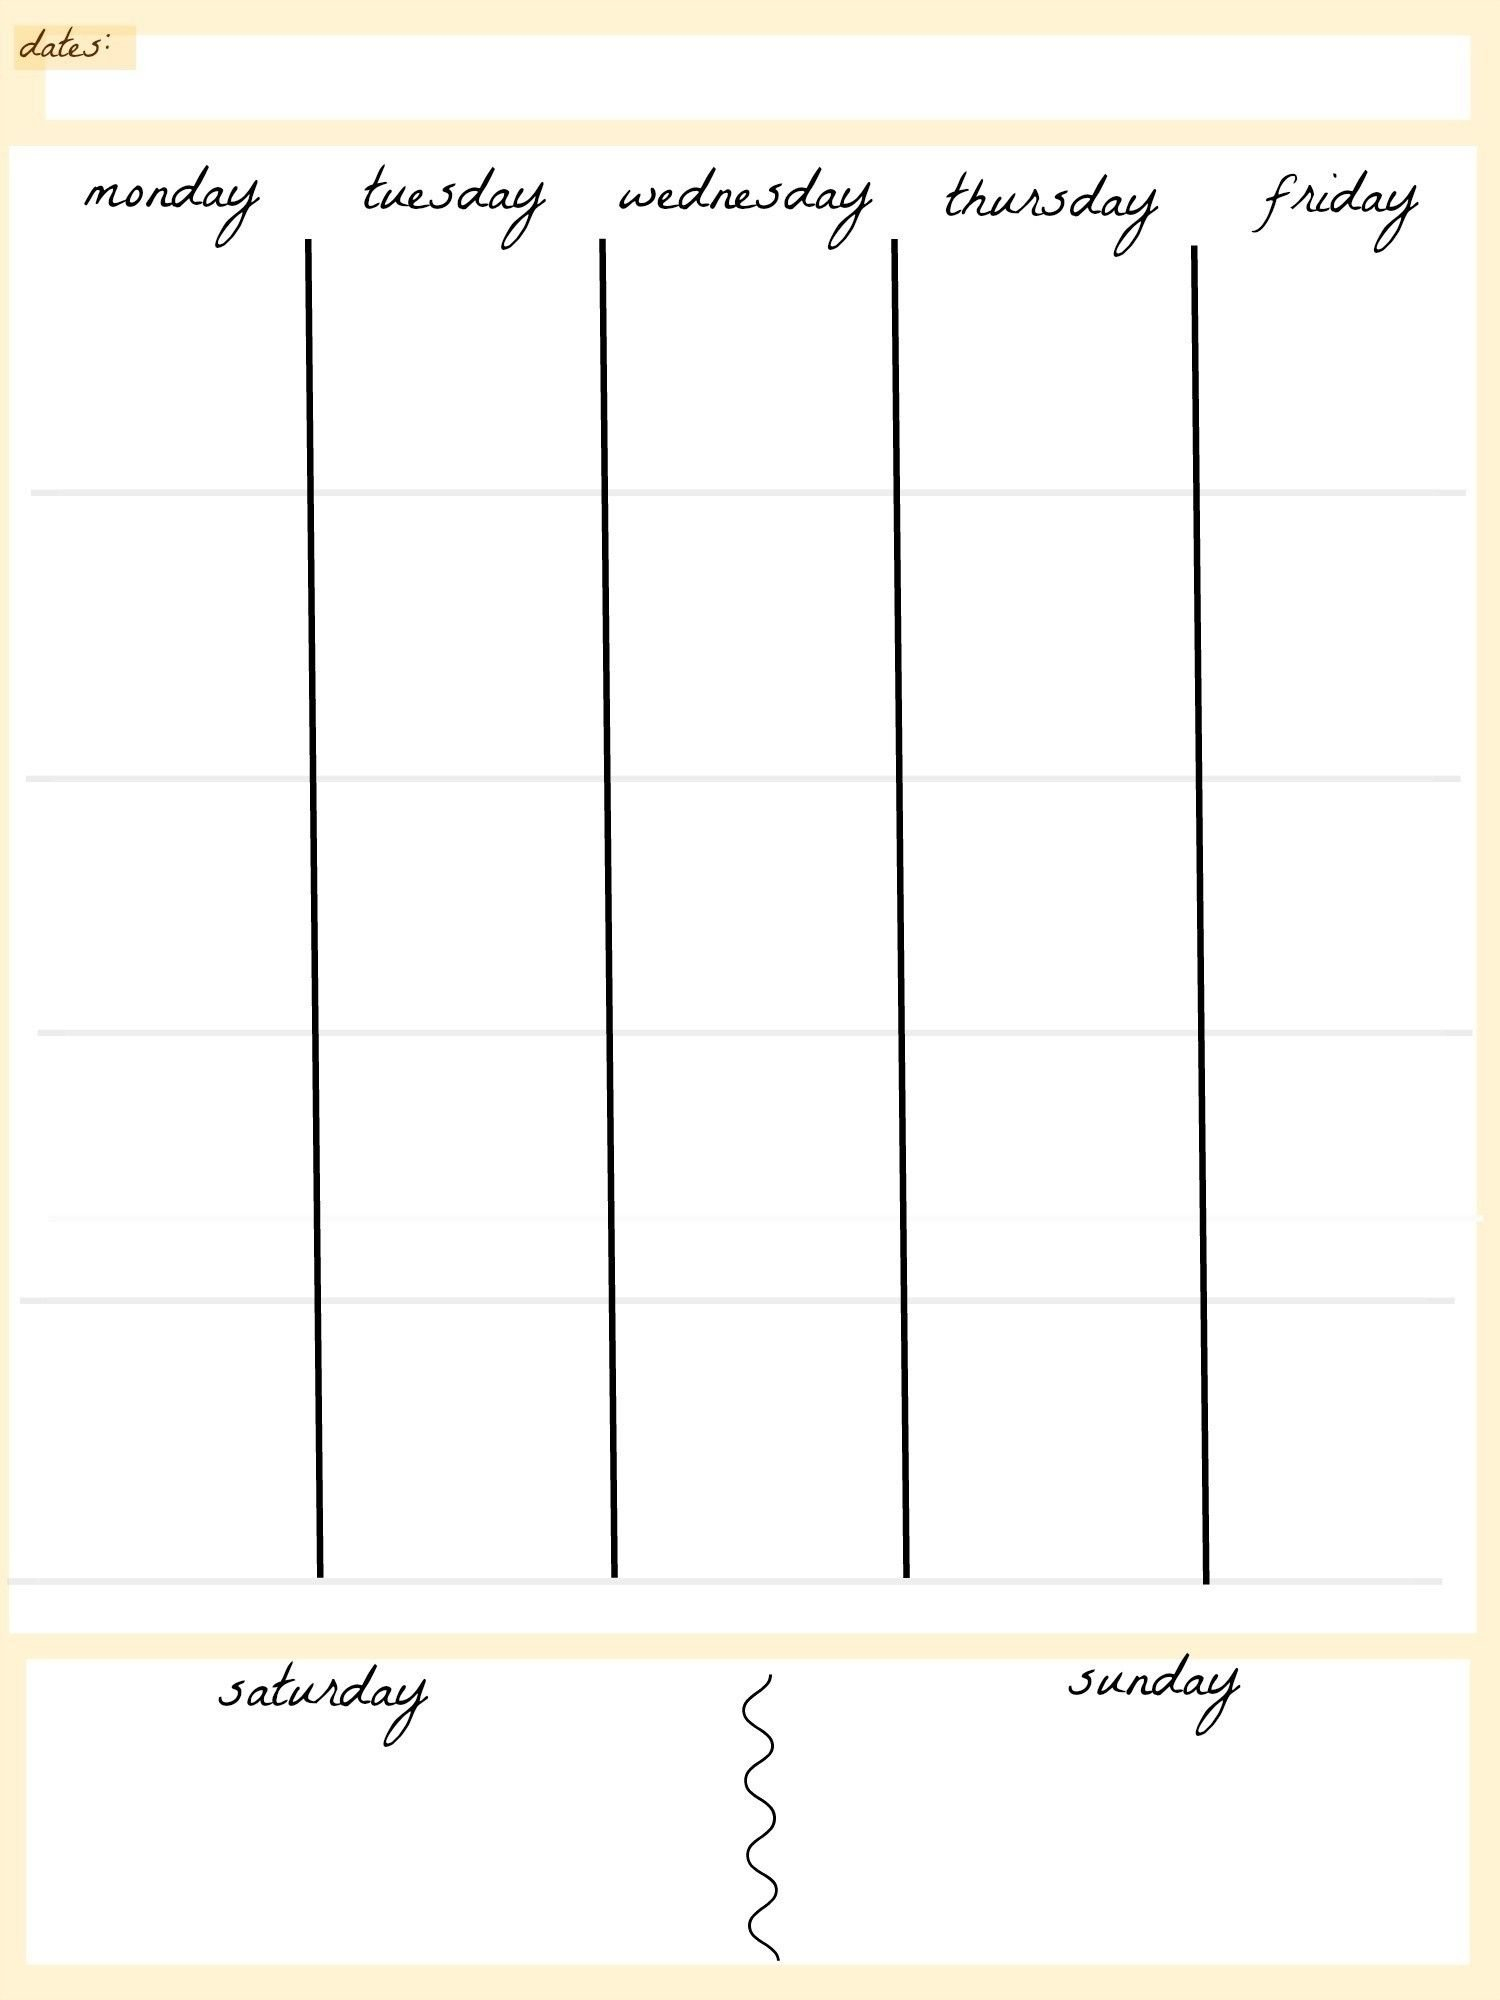 Free Printable Calendar 5 Day Week   Calendar Printables Free 5 Day Calendar Template